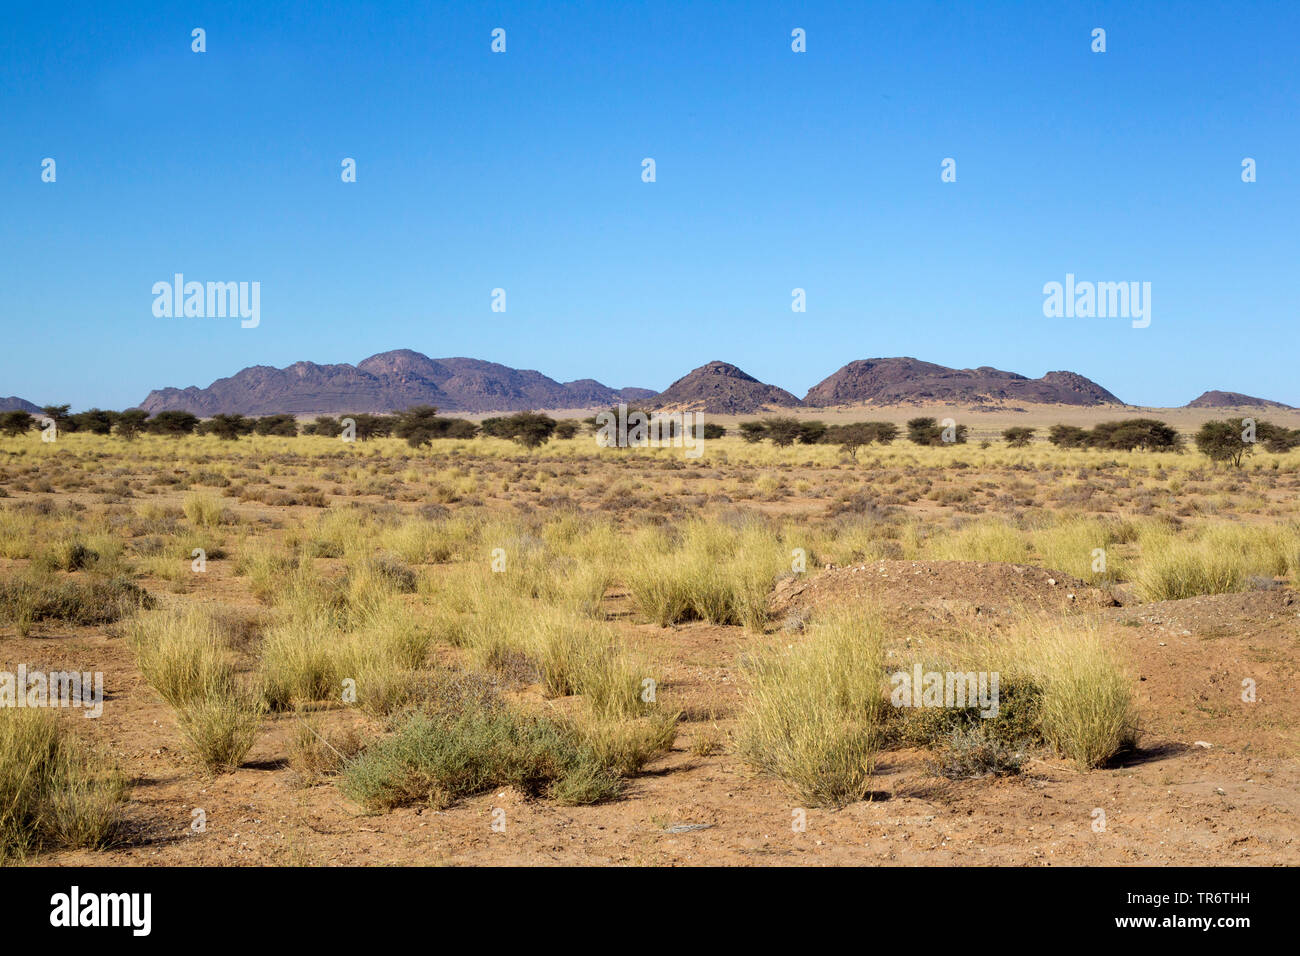 Oued Jenna, Morocco, Western Sahara, Aousserd area, Oued Jenna - Stock Image